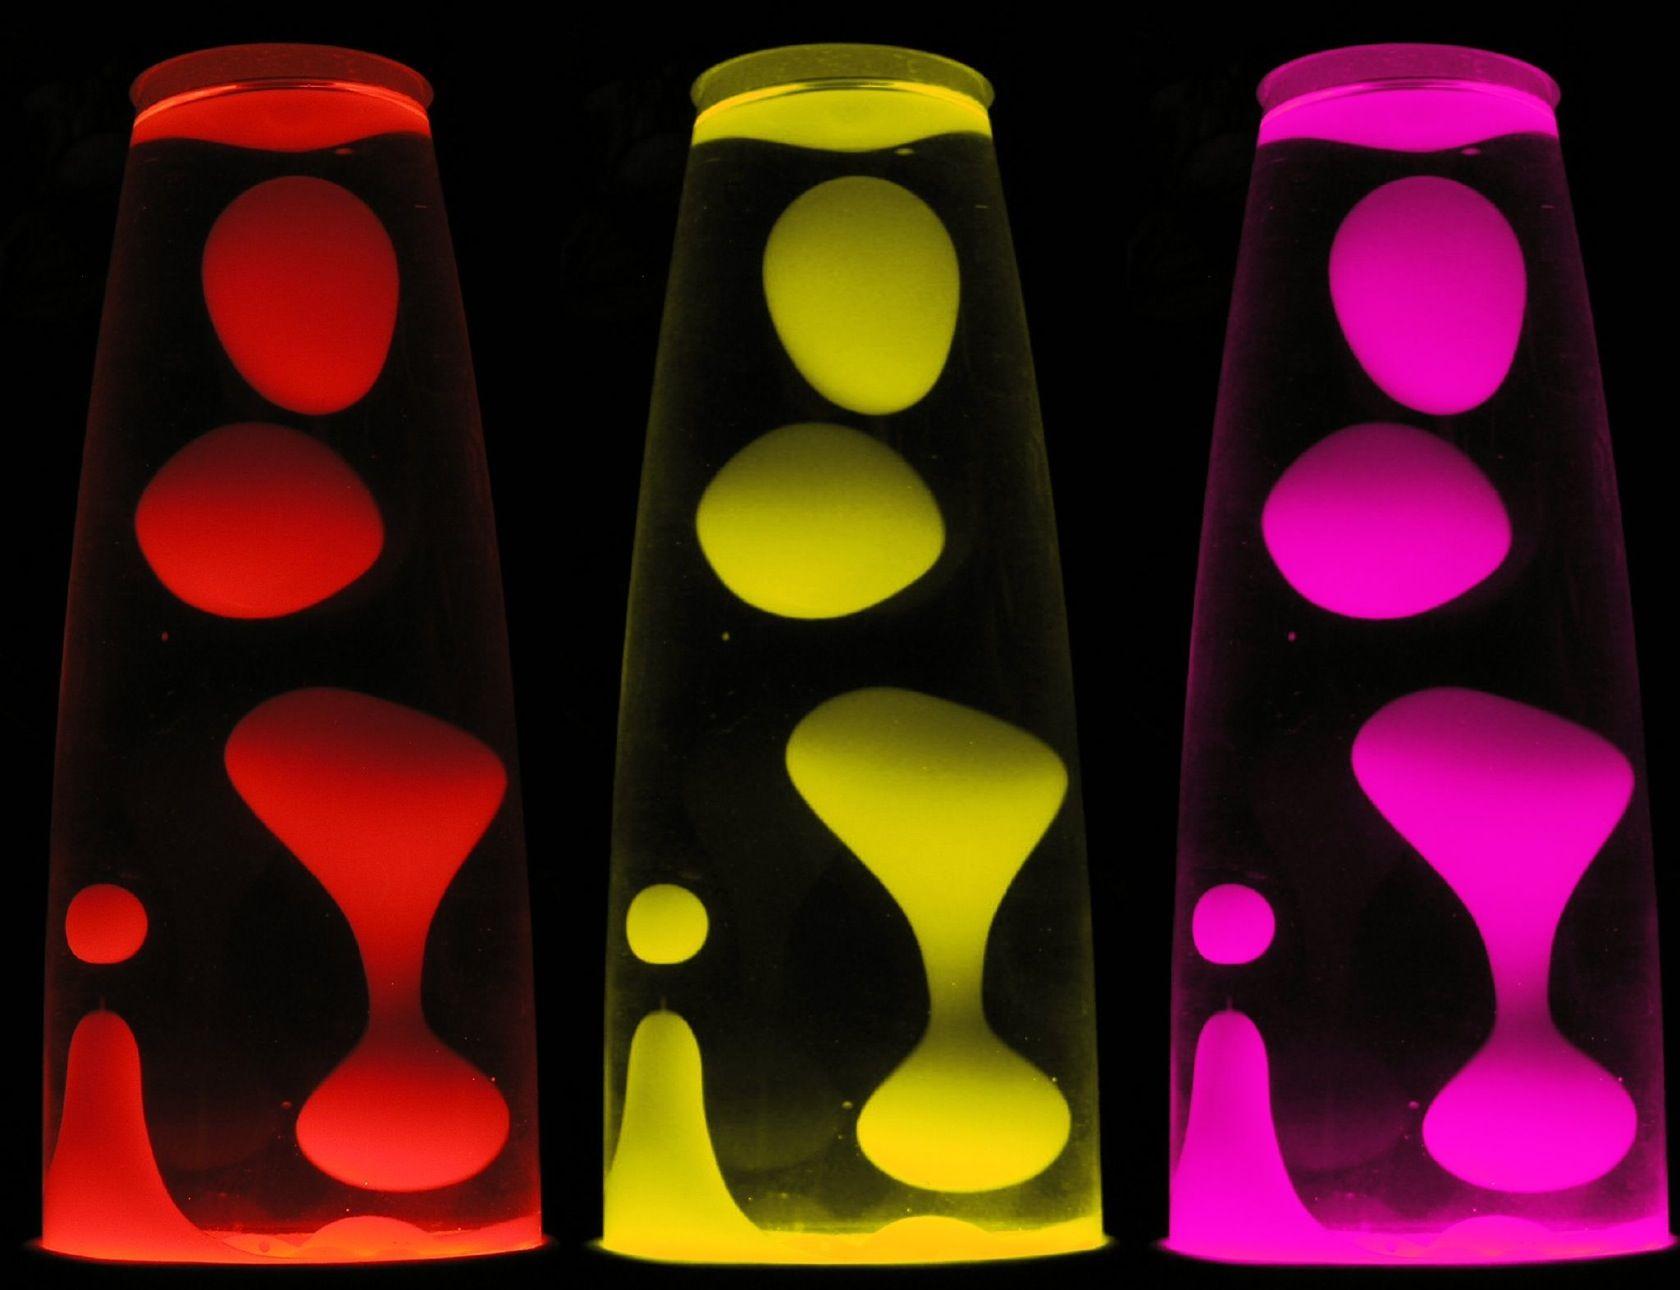 Moving Lava Lamp Wallpaper - WallpaperSafari | Android | Pinterest ... for Moving Lava Lamp Background  186ref